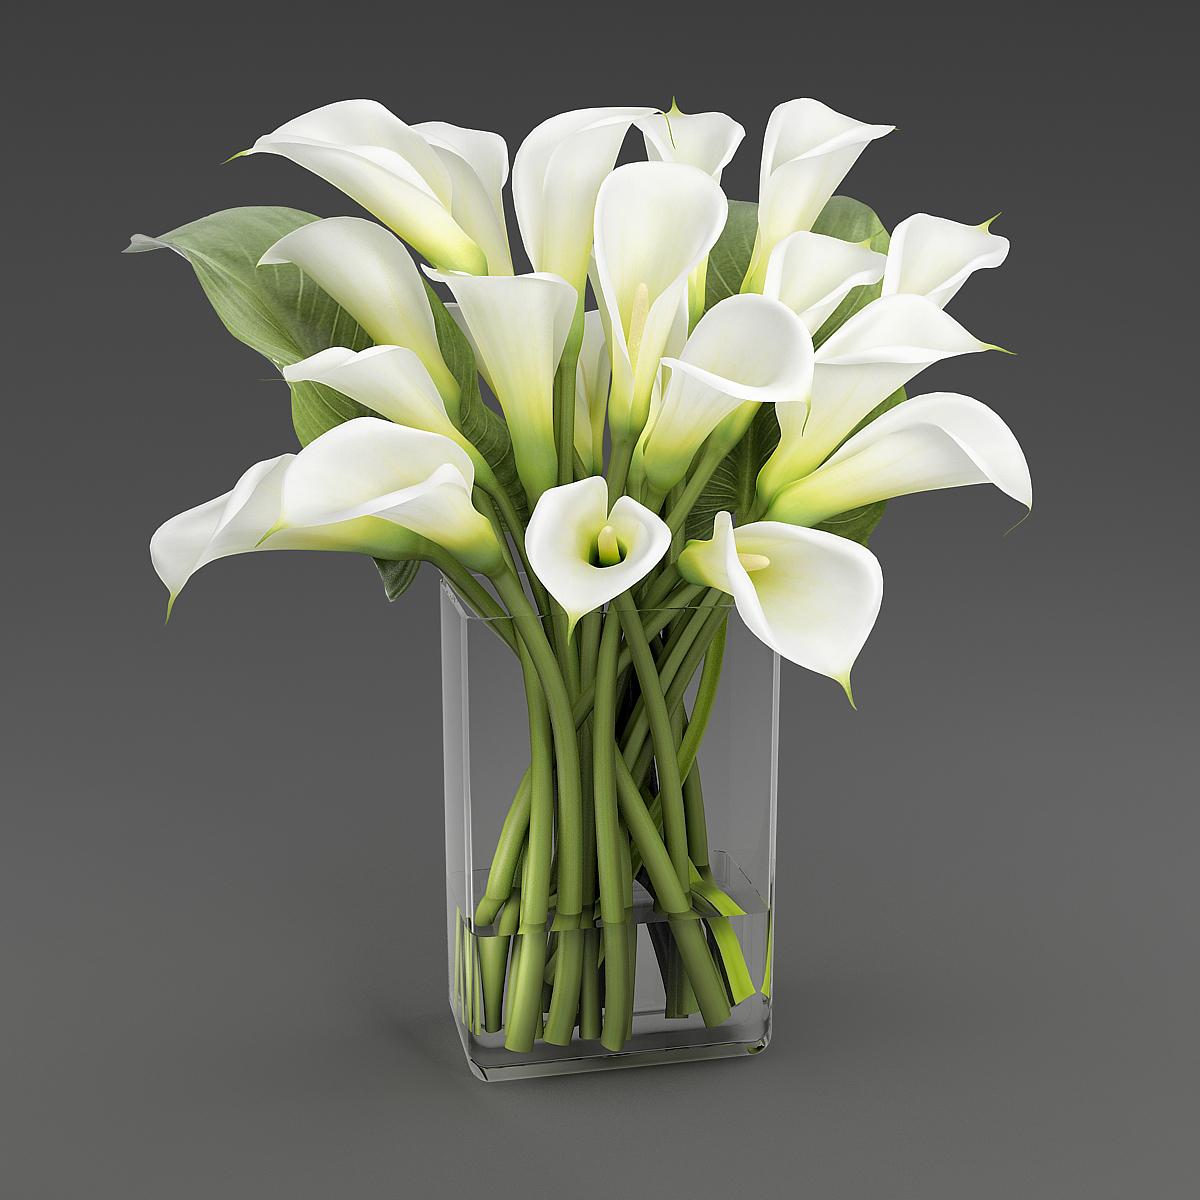 Bouquet Calla Lilies 3d Model Turbosquid 1296709